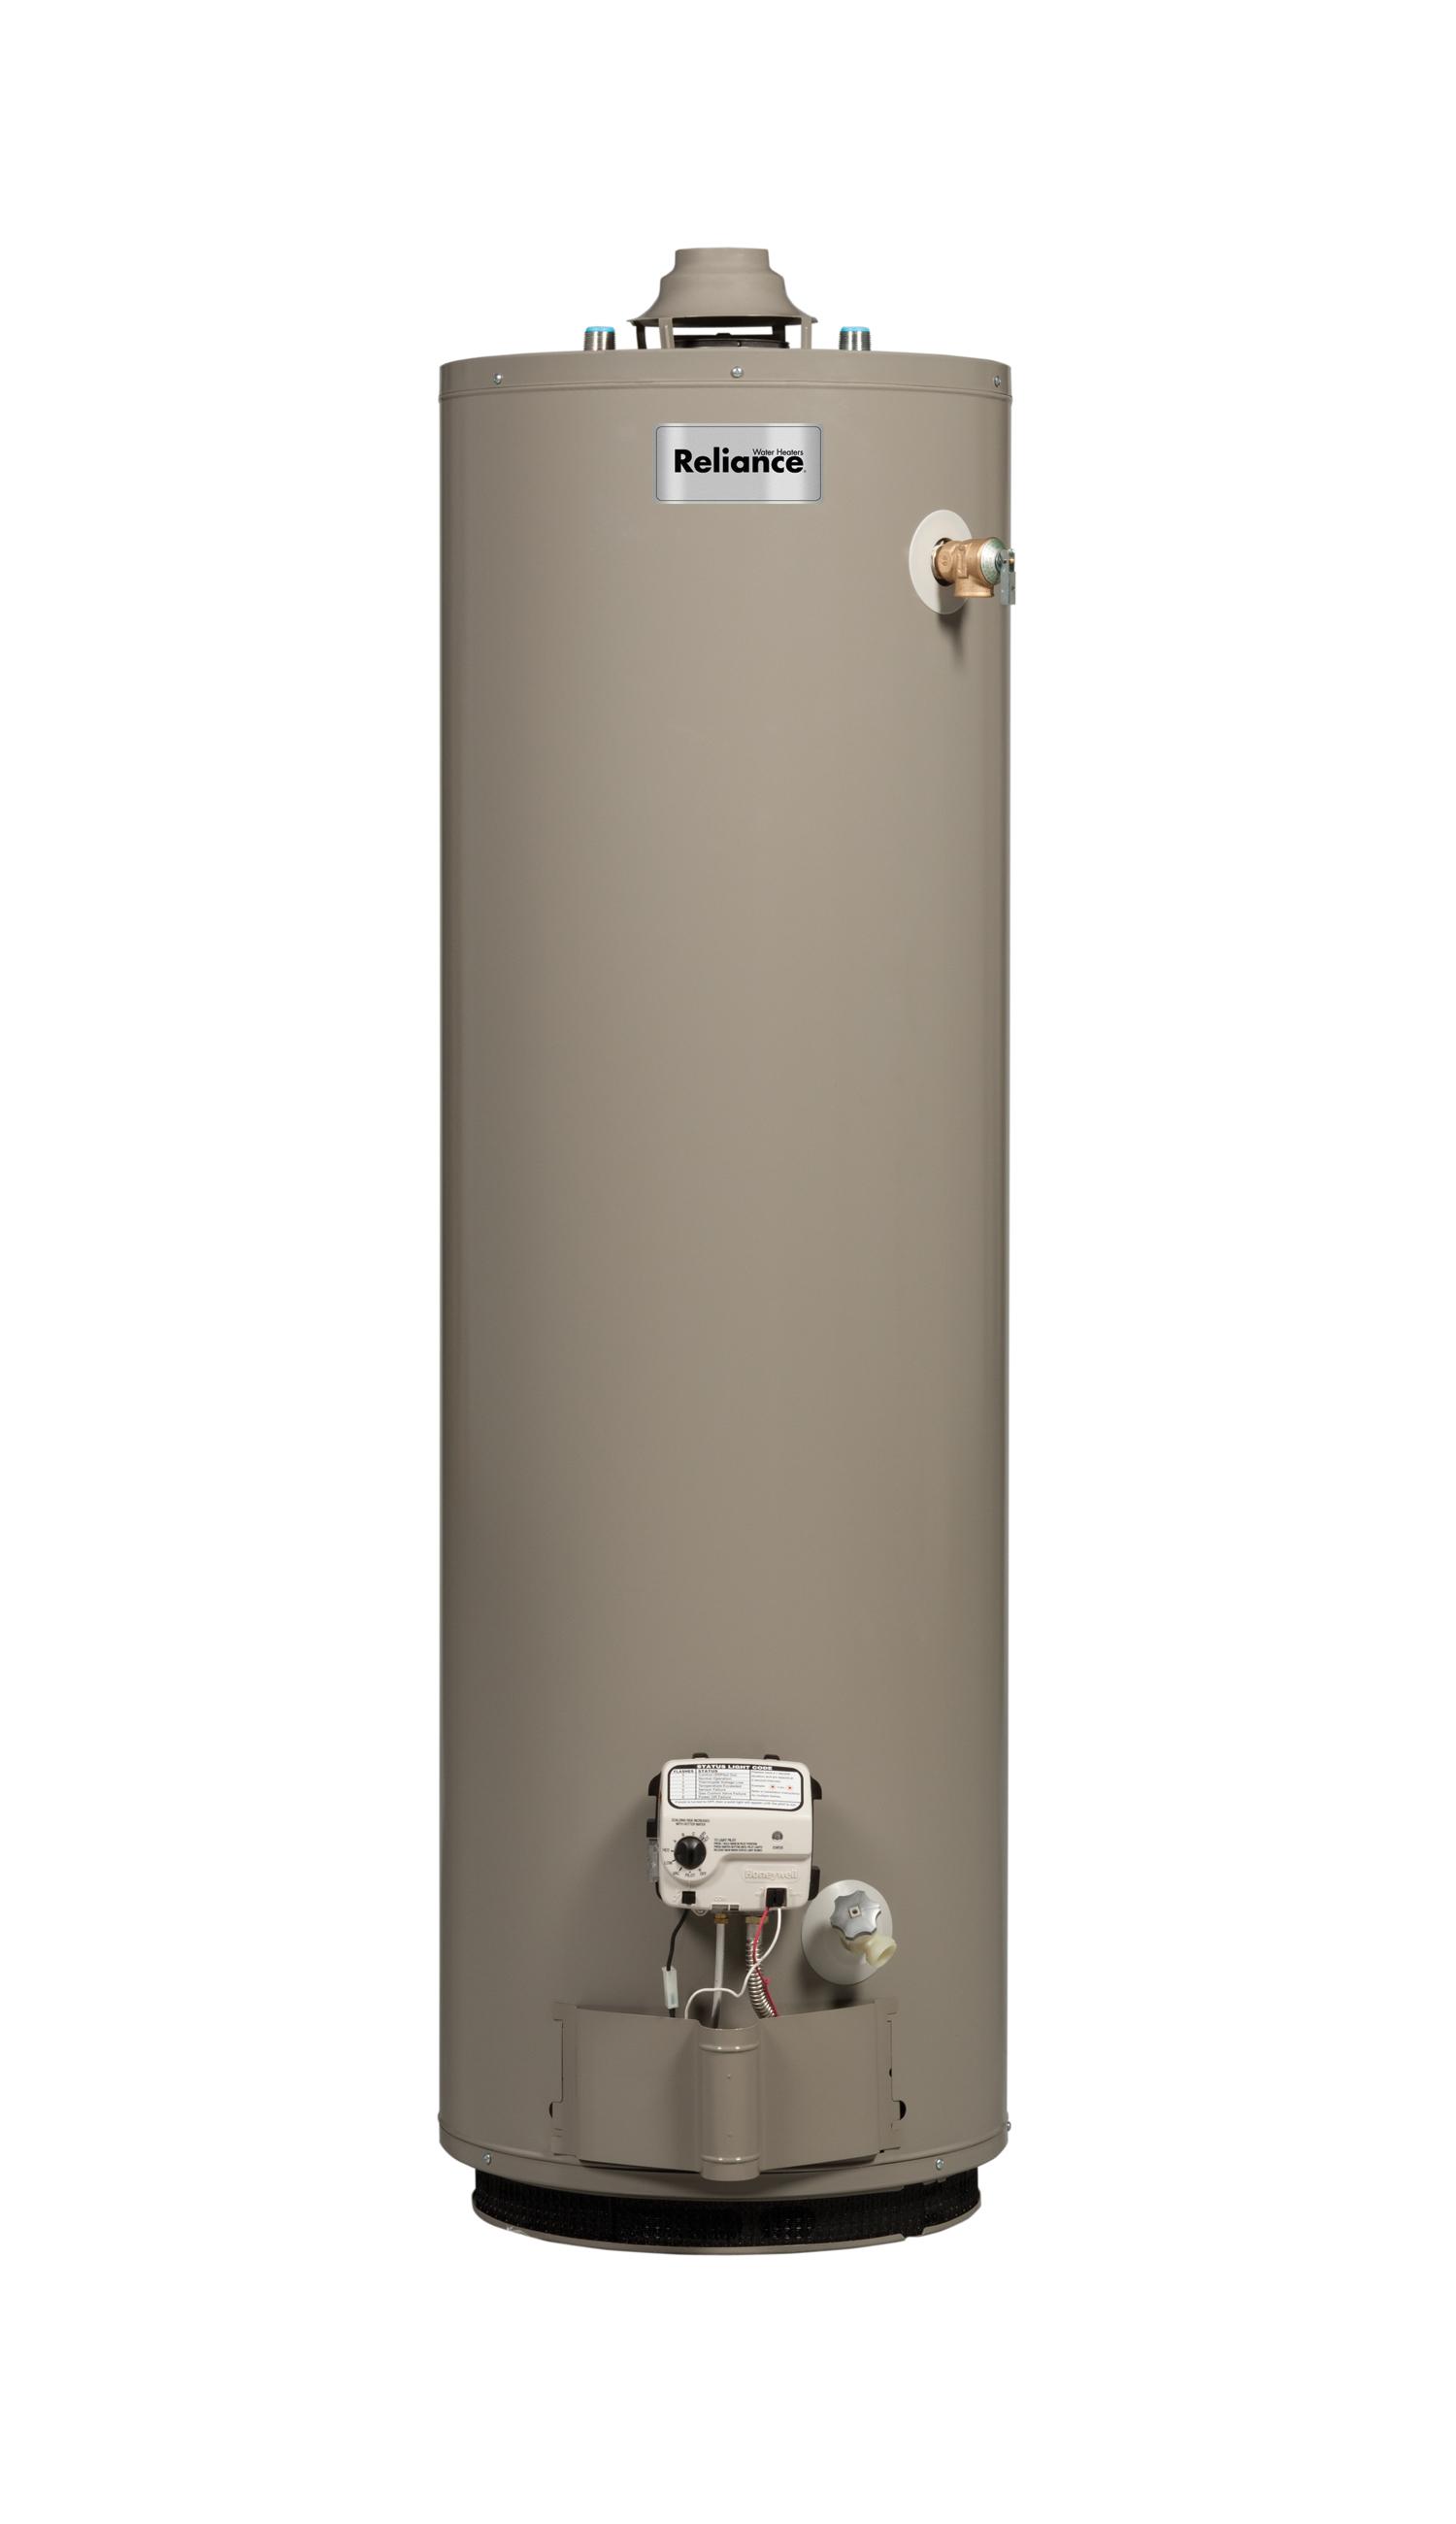 ... Water Heater | Reliance Water Heaters - Your Neighborhood Water Heater